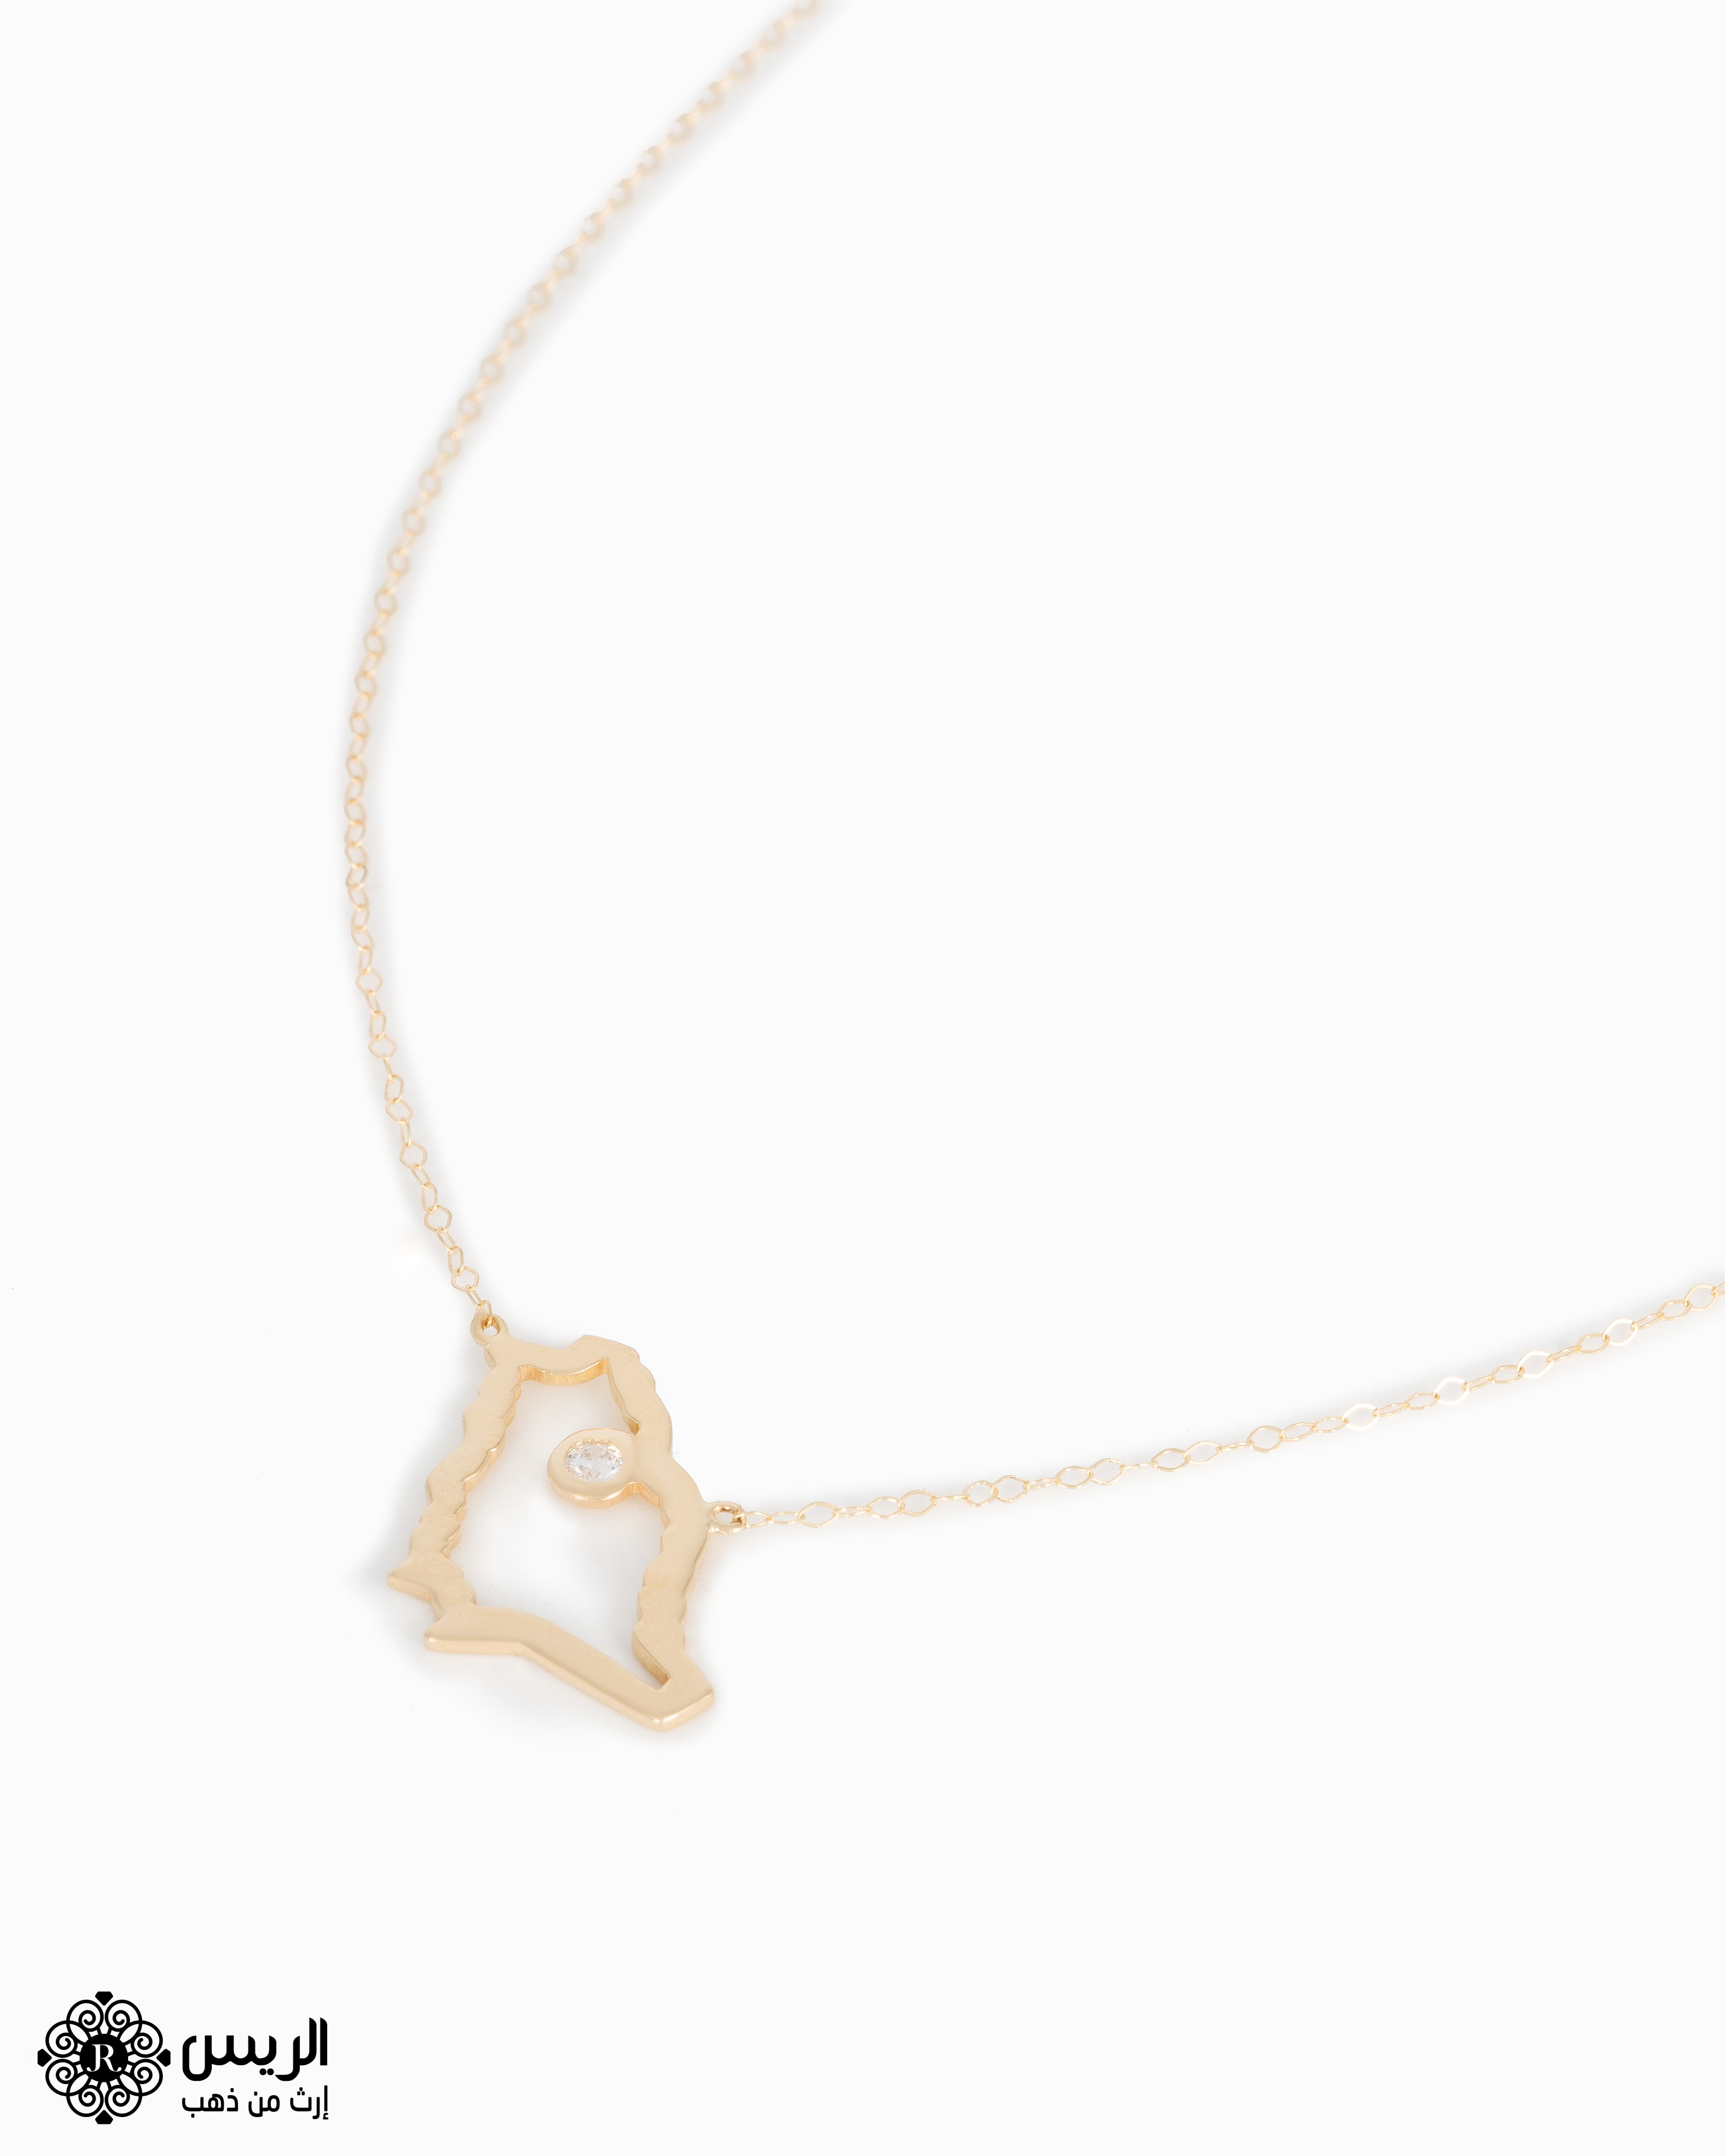 Raies jewelry Necklace With Chain KSA Map تعليقة مع سلسله خريطة المملكة الريس للمجوهرات